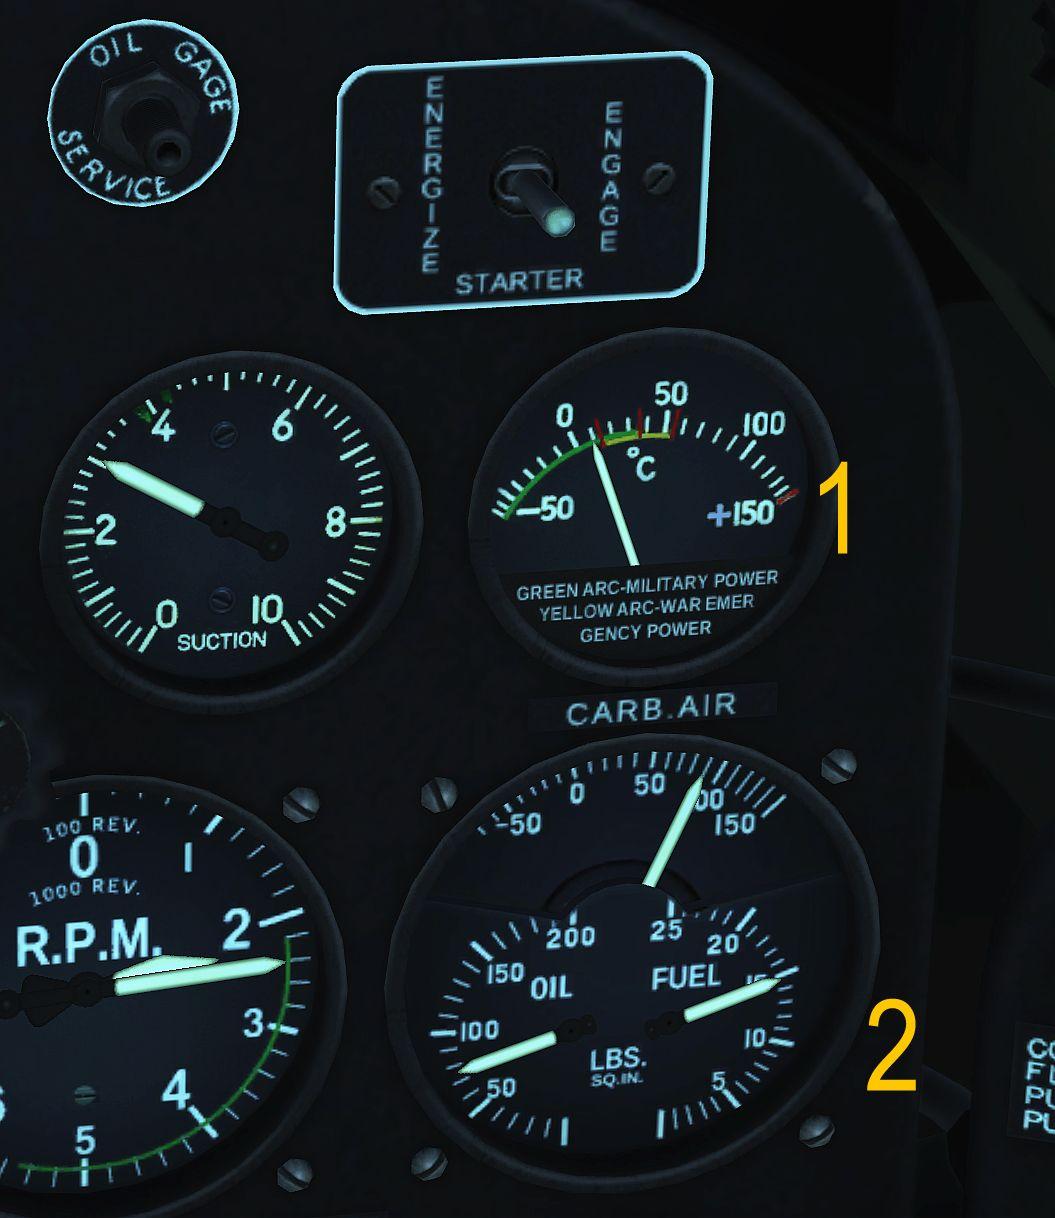 [FICHE] Republic P47-D-28-RE 5bdaa4825b1eb